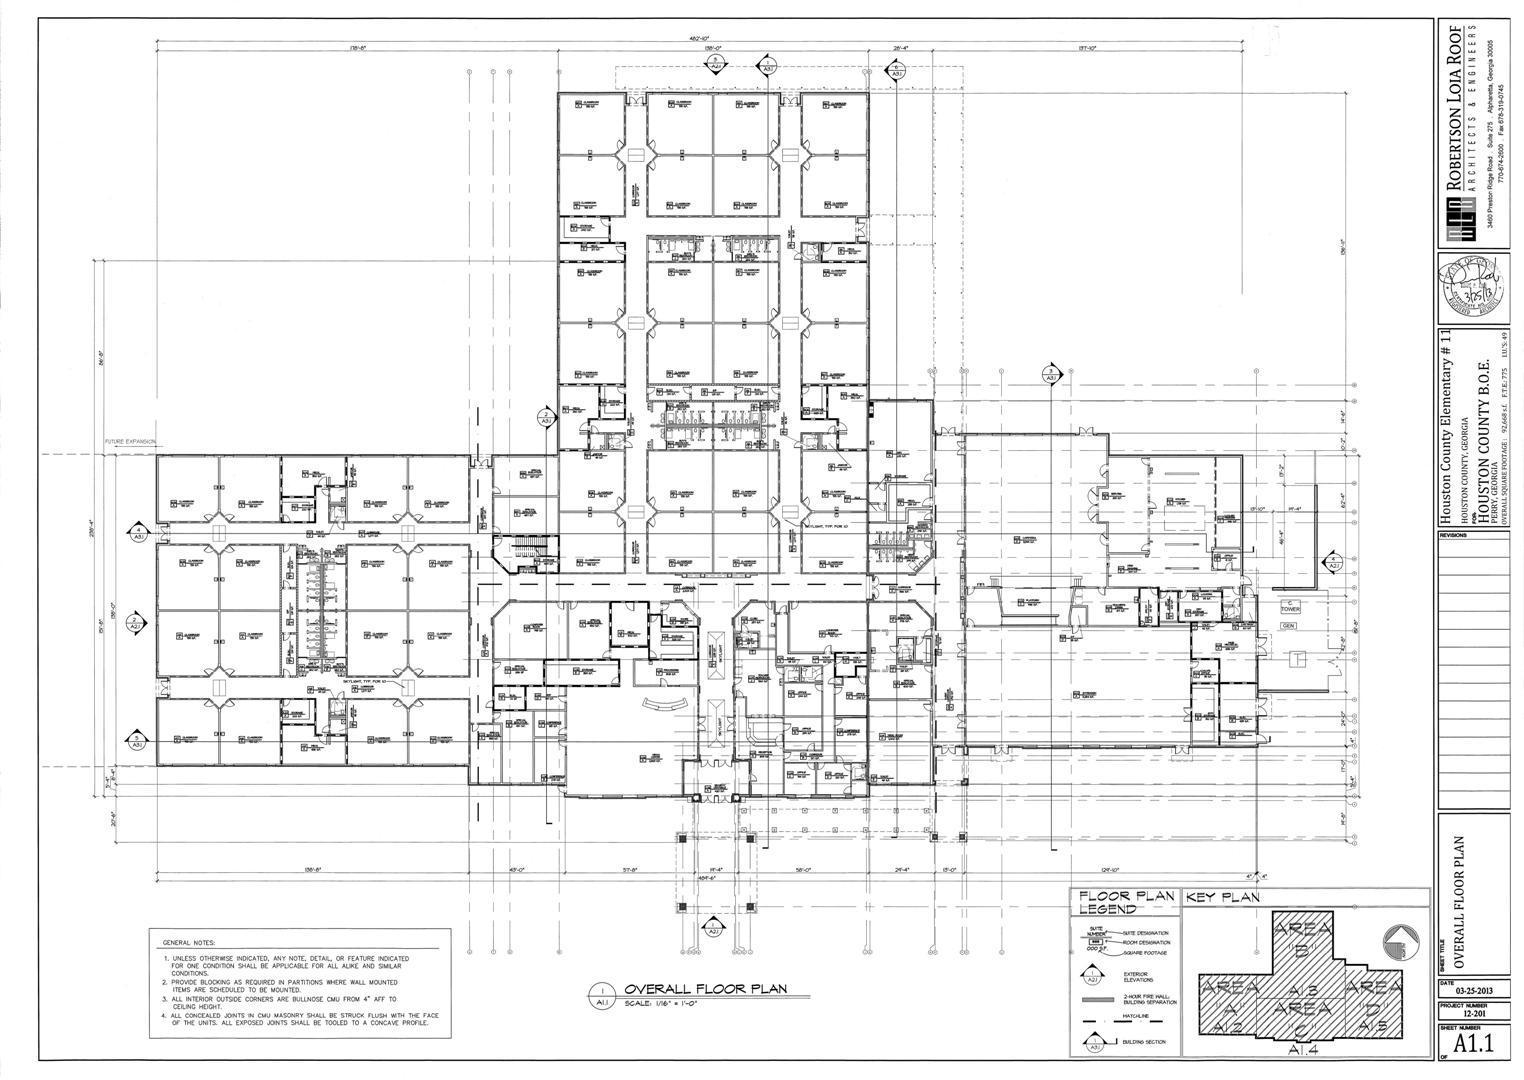 Langston Road Elementary Overall Floor Plan